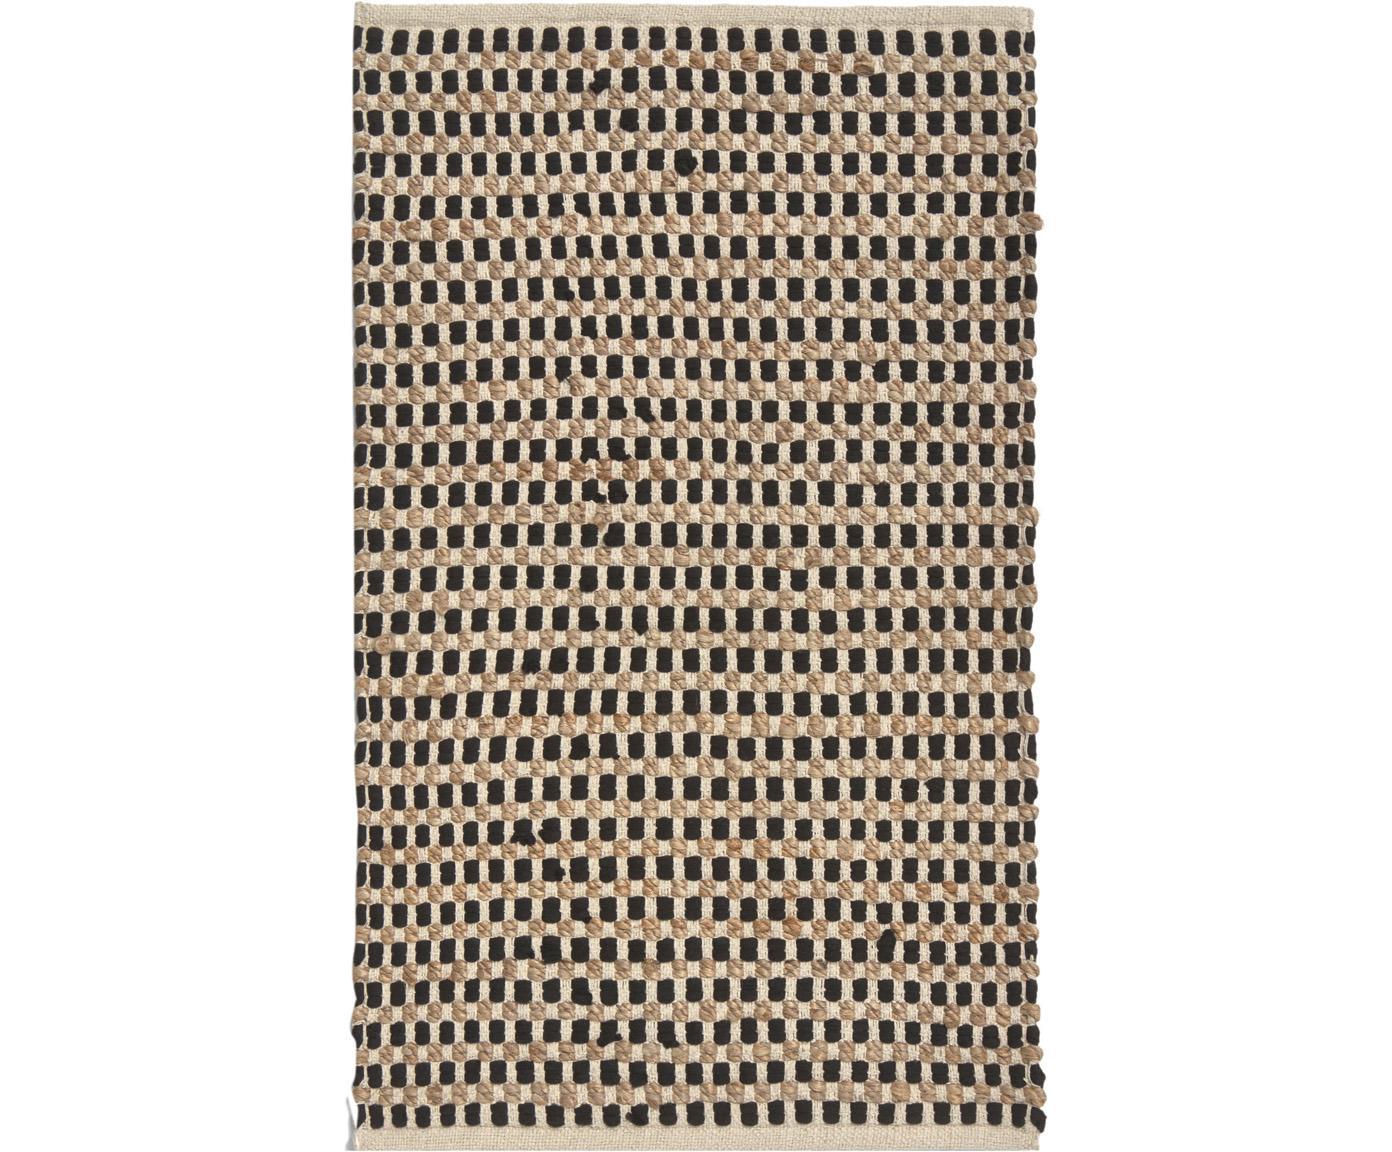 Alfombra de algodón/yute Fiesta, 55%algodón Chindi , 45%yute, Negro, beige, An 60 x L 90 cm (Tamaño XXS)